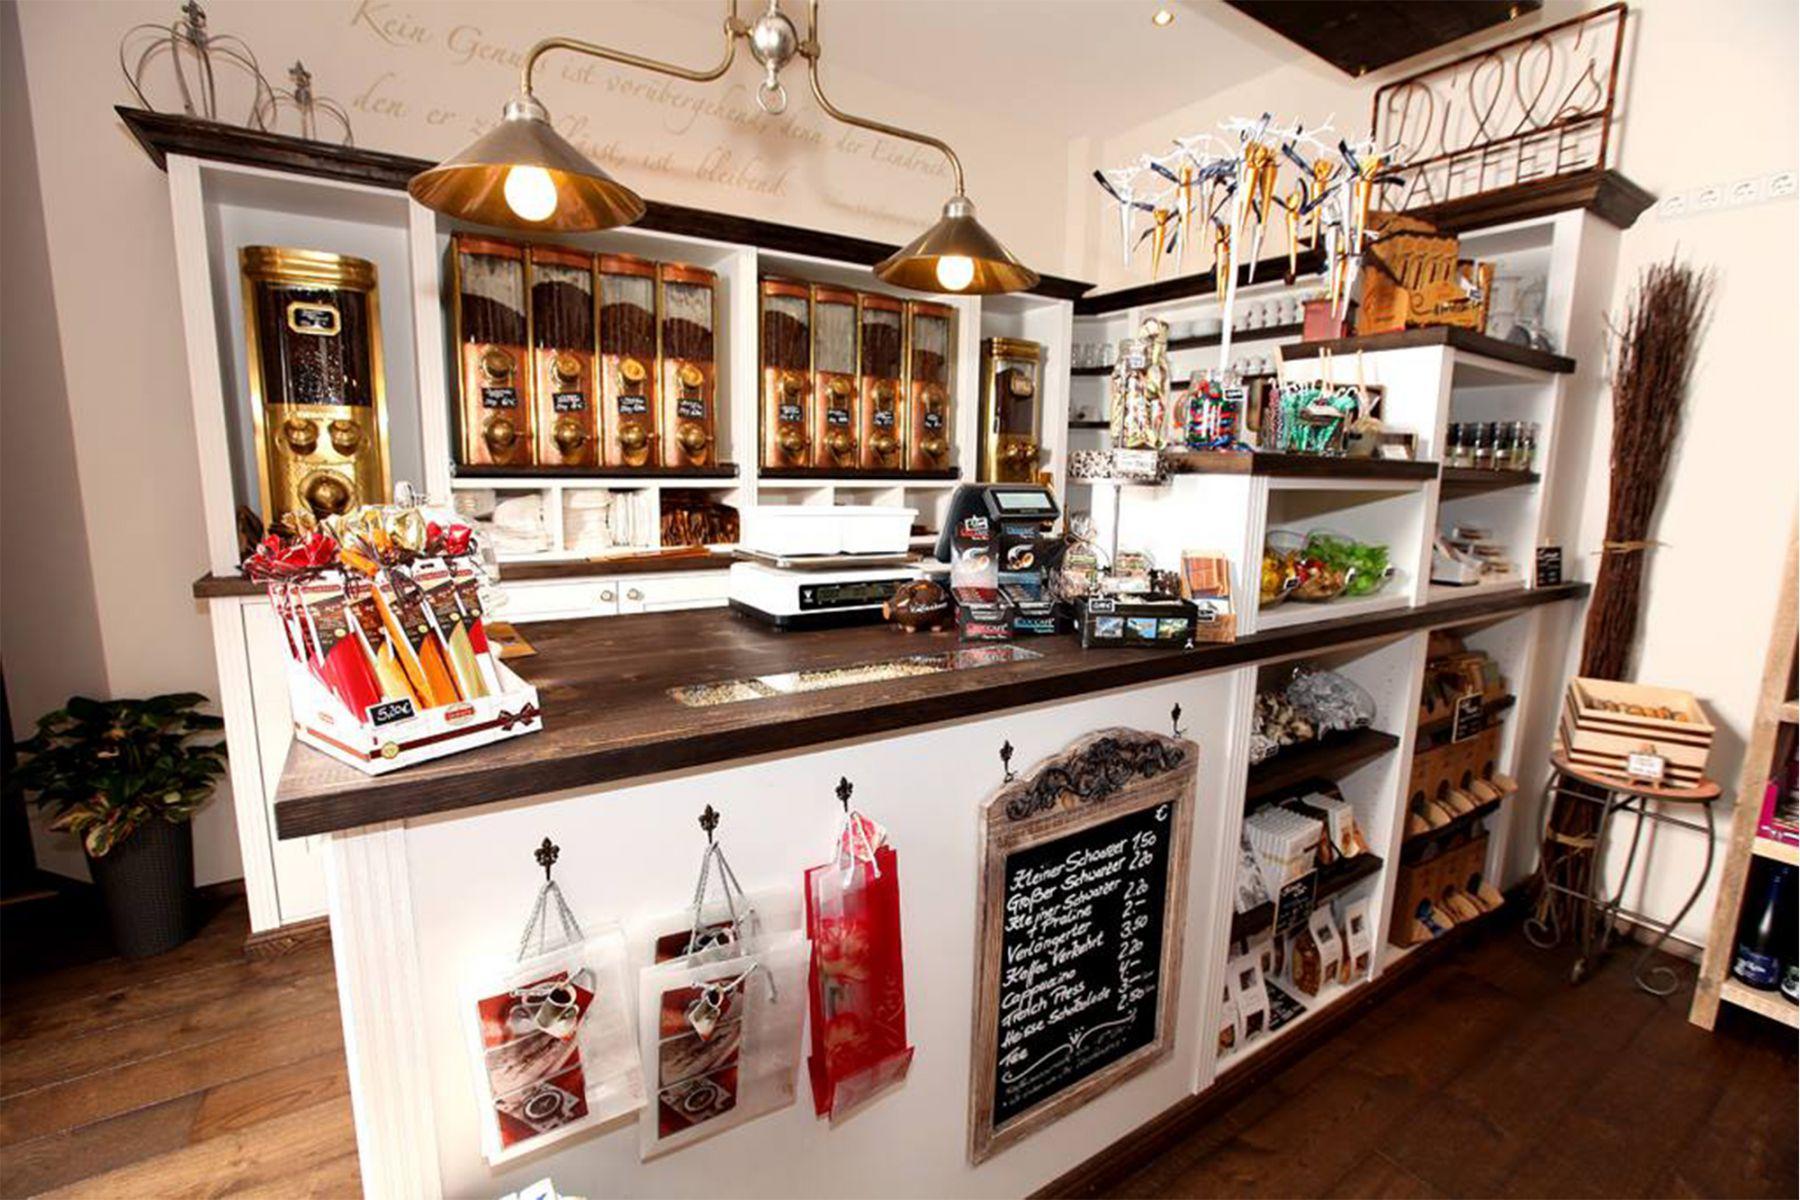 Dill's Kaffeemanufaktur in Goslar   Credit: Dill's Kaffeemanufaktur